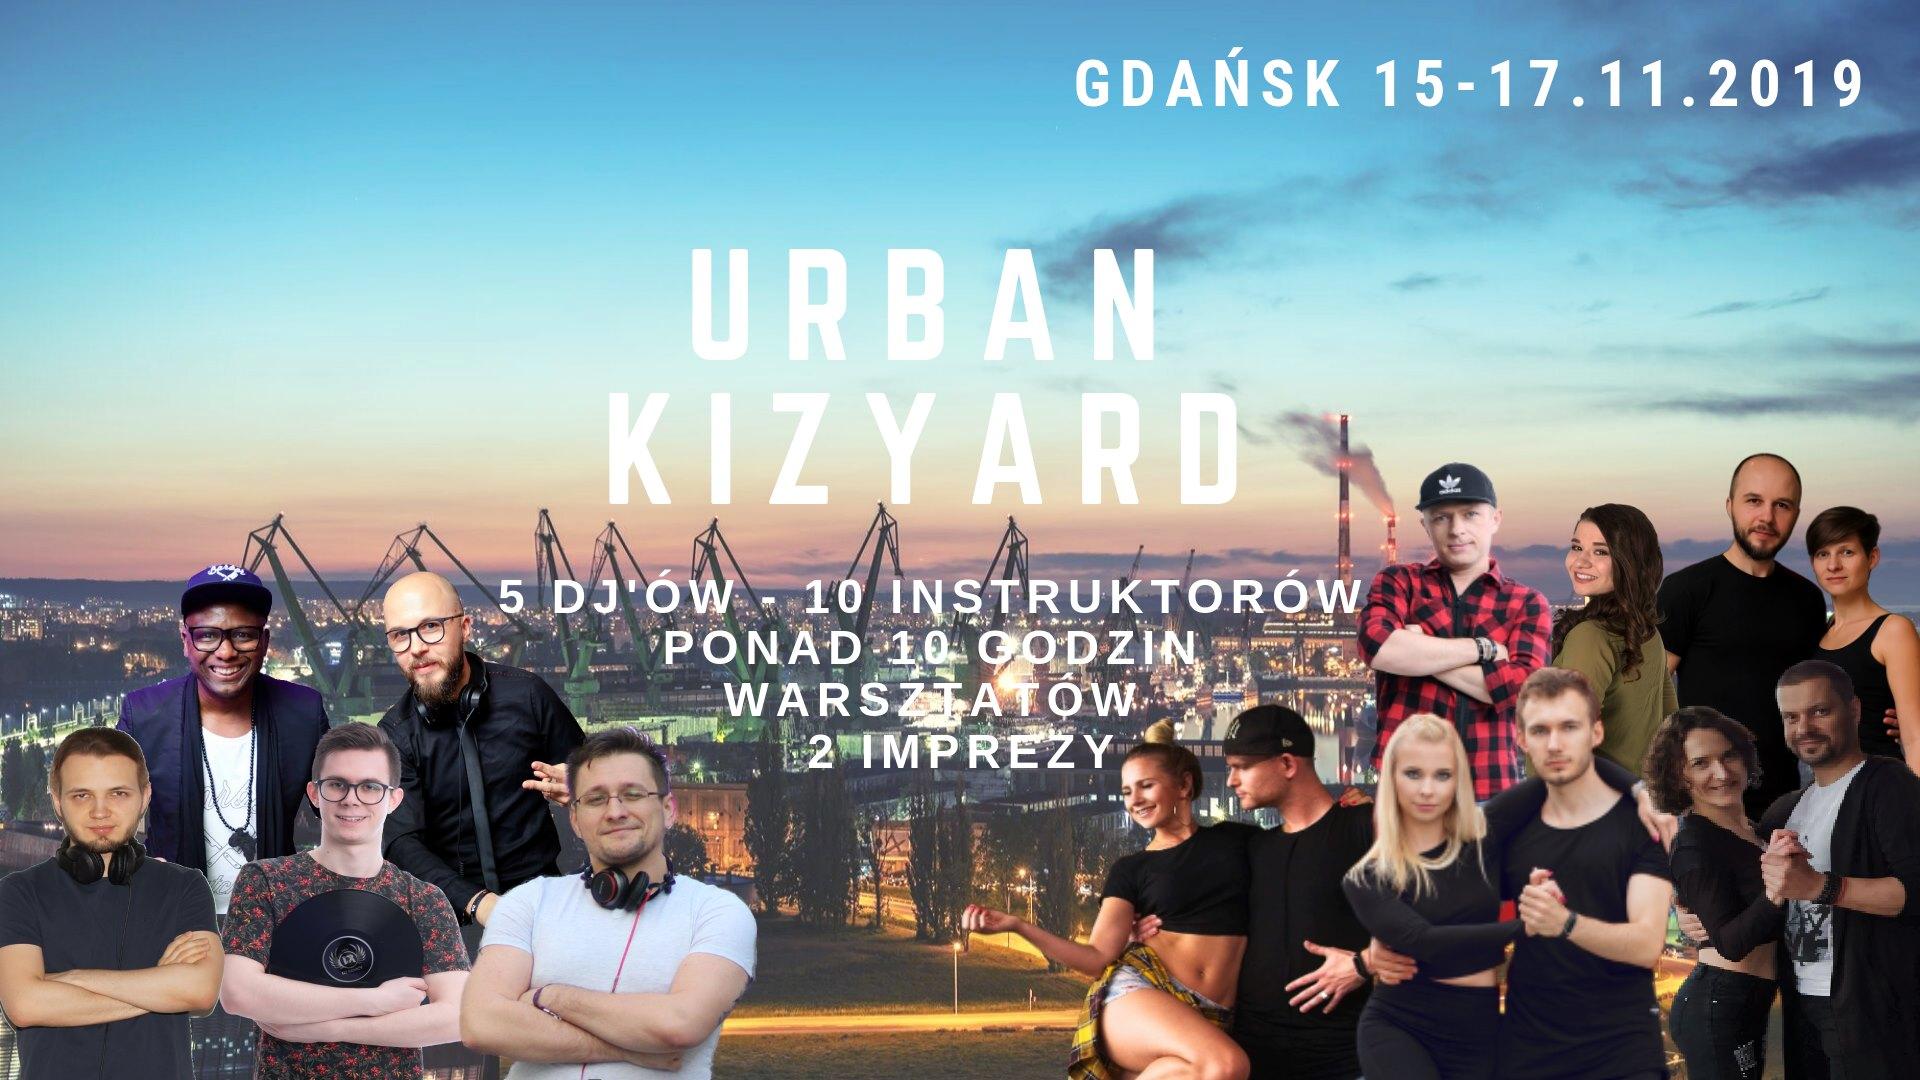 Urban Kizyard 15.11 - 17.11.2019